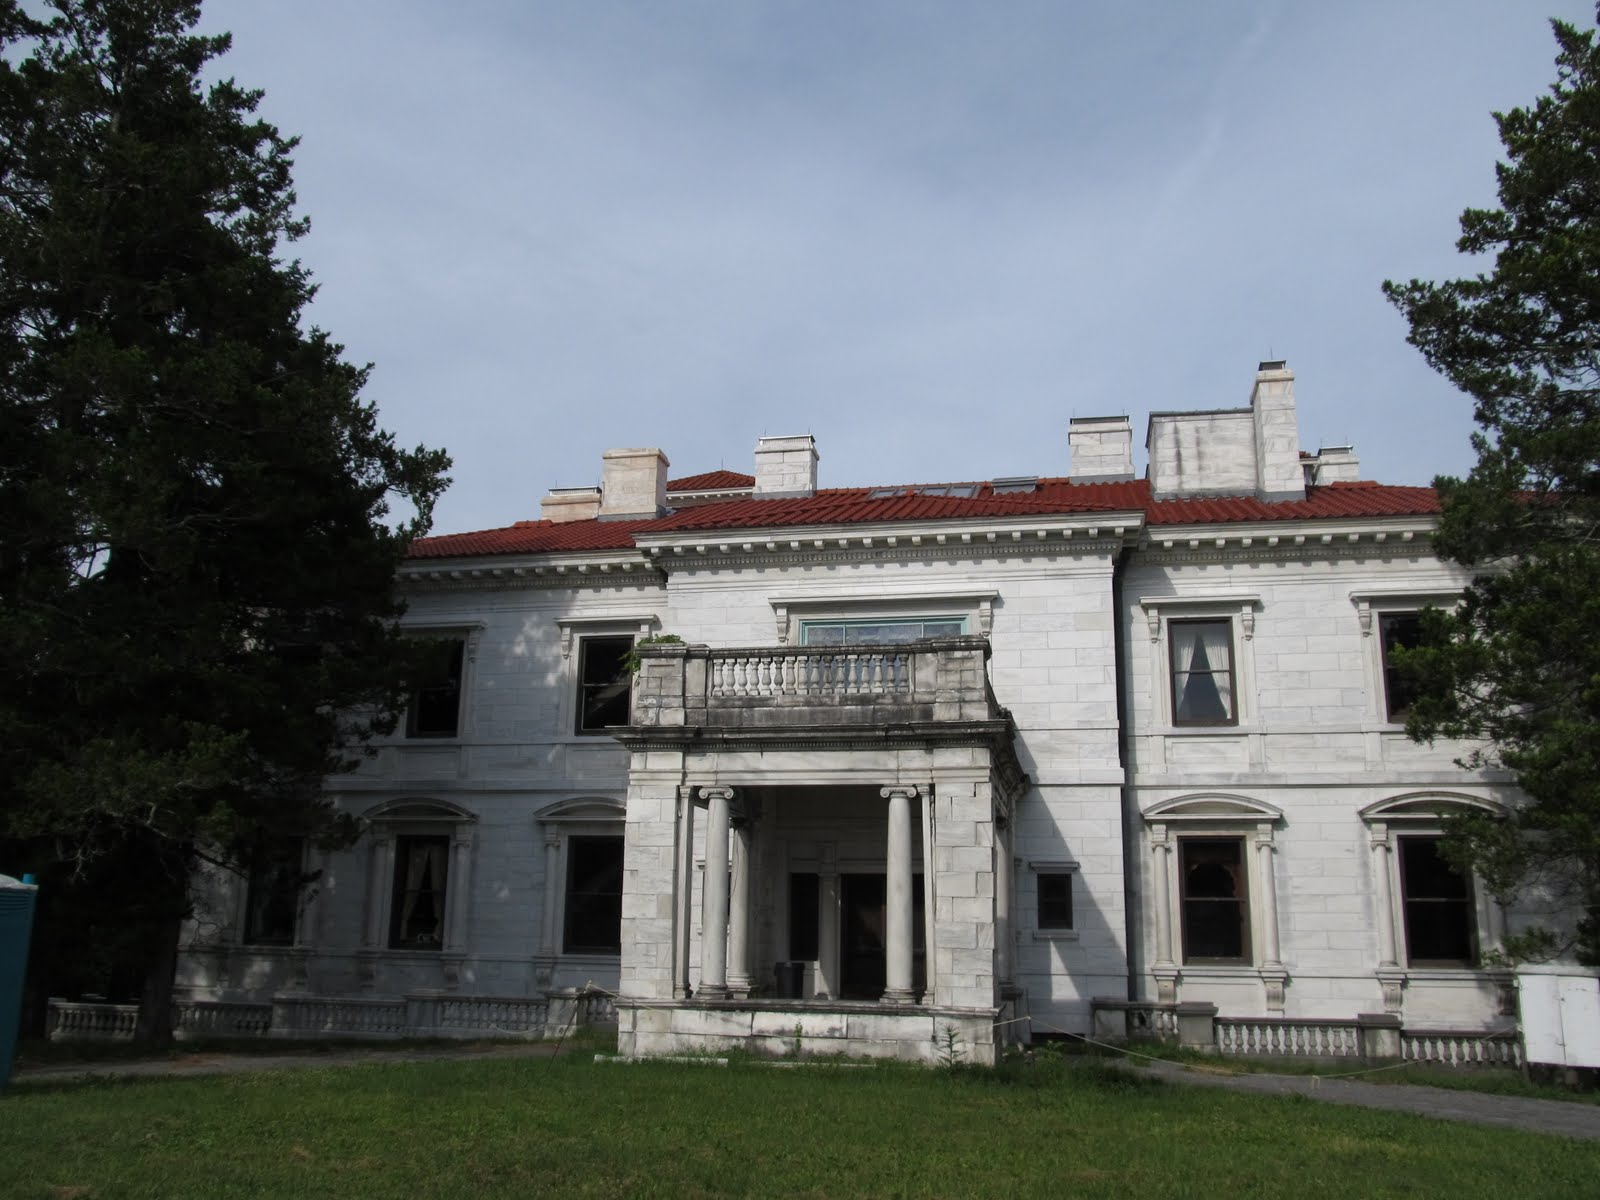 Abandoned Albemarle Swannanoa Palace Afton Mountain